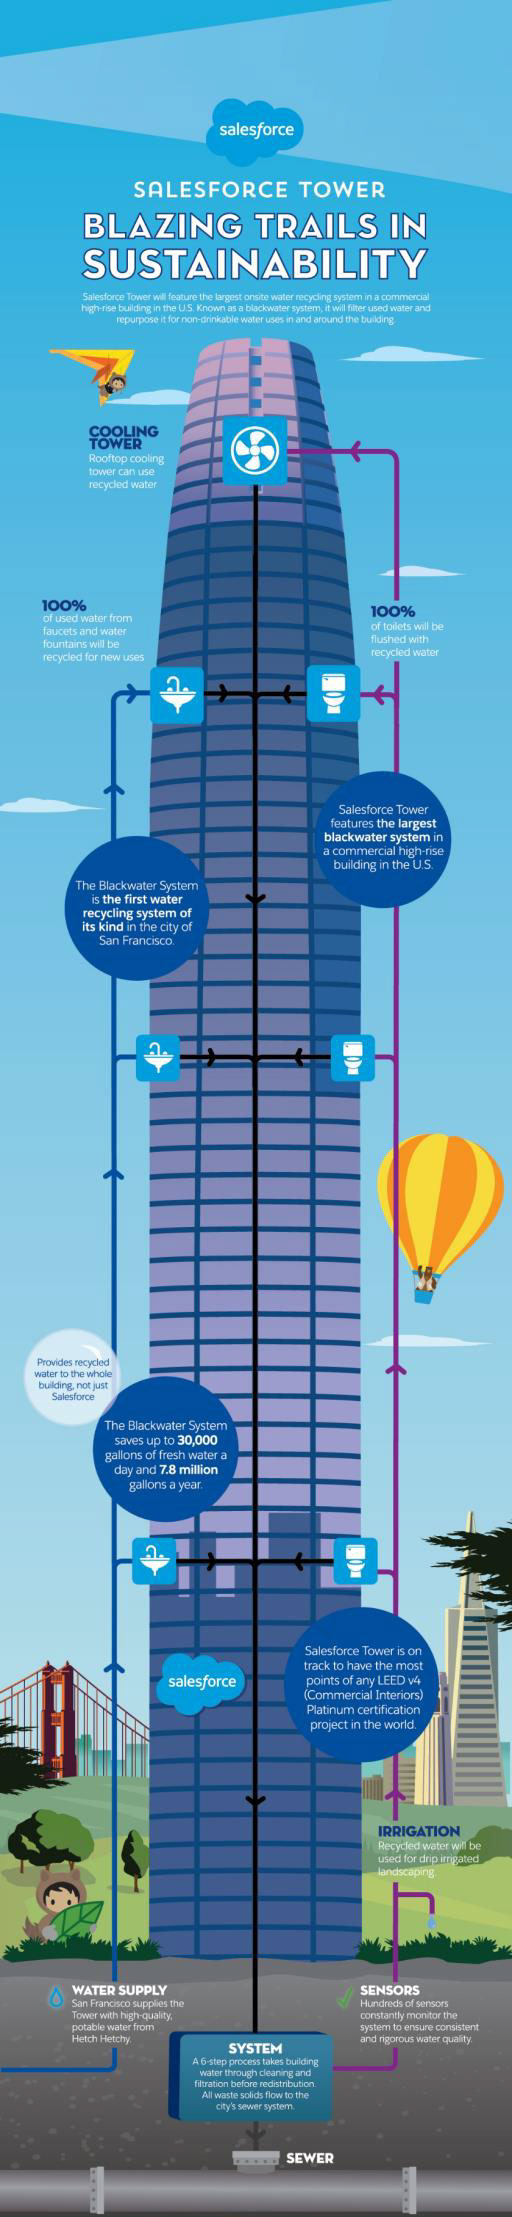 Salesforce tower feature illustration